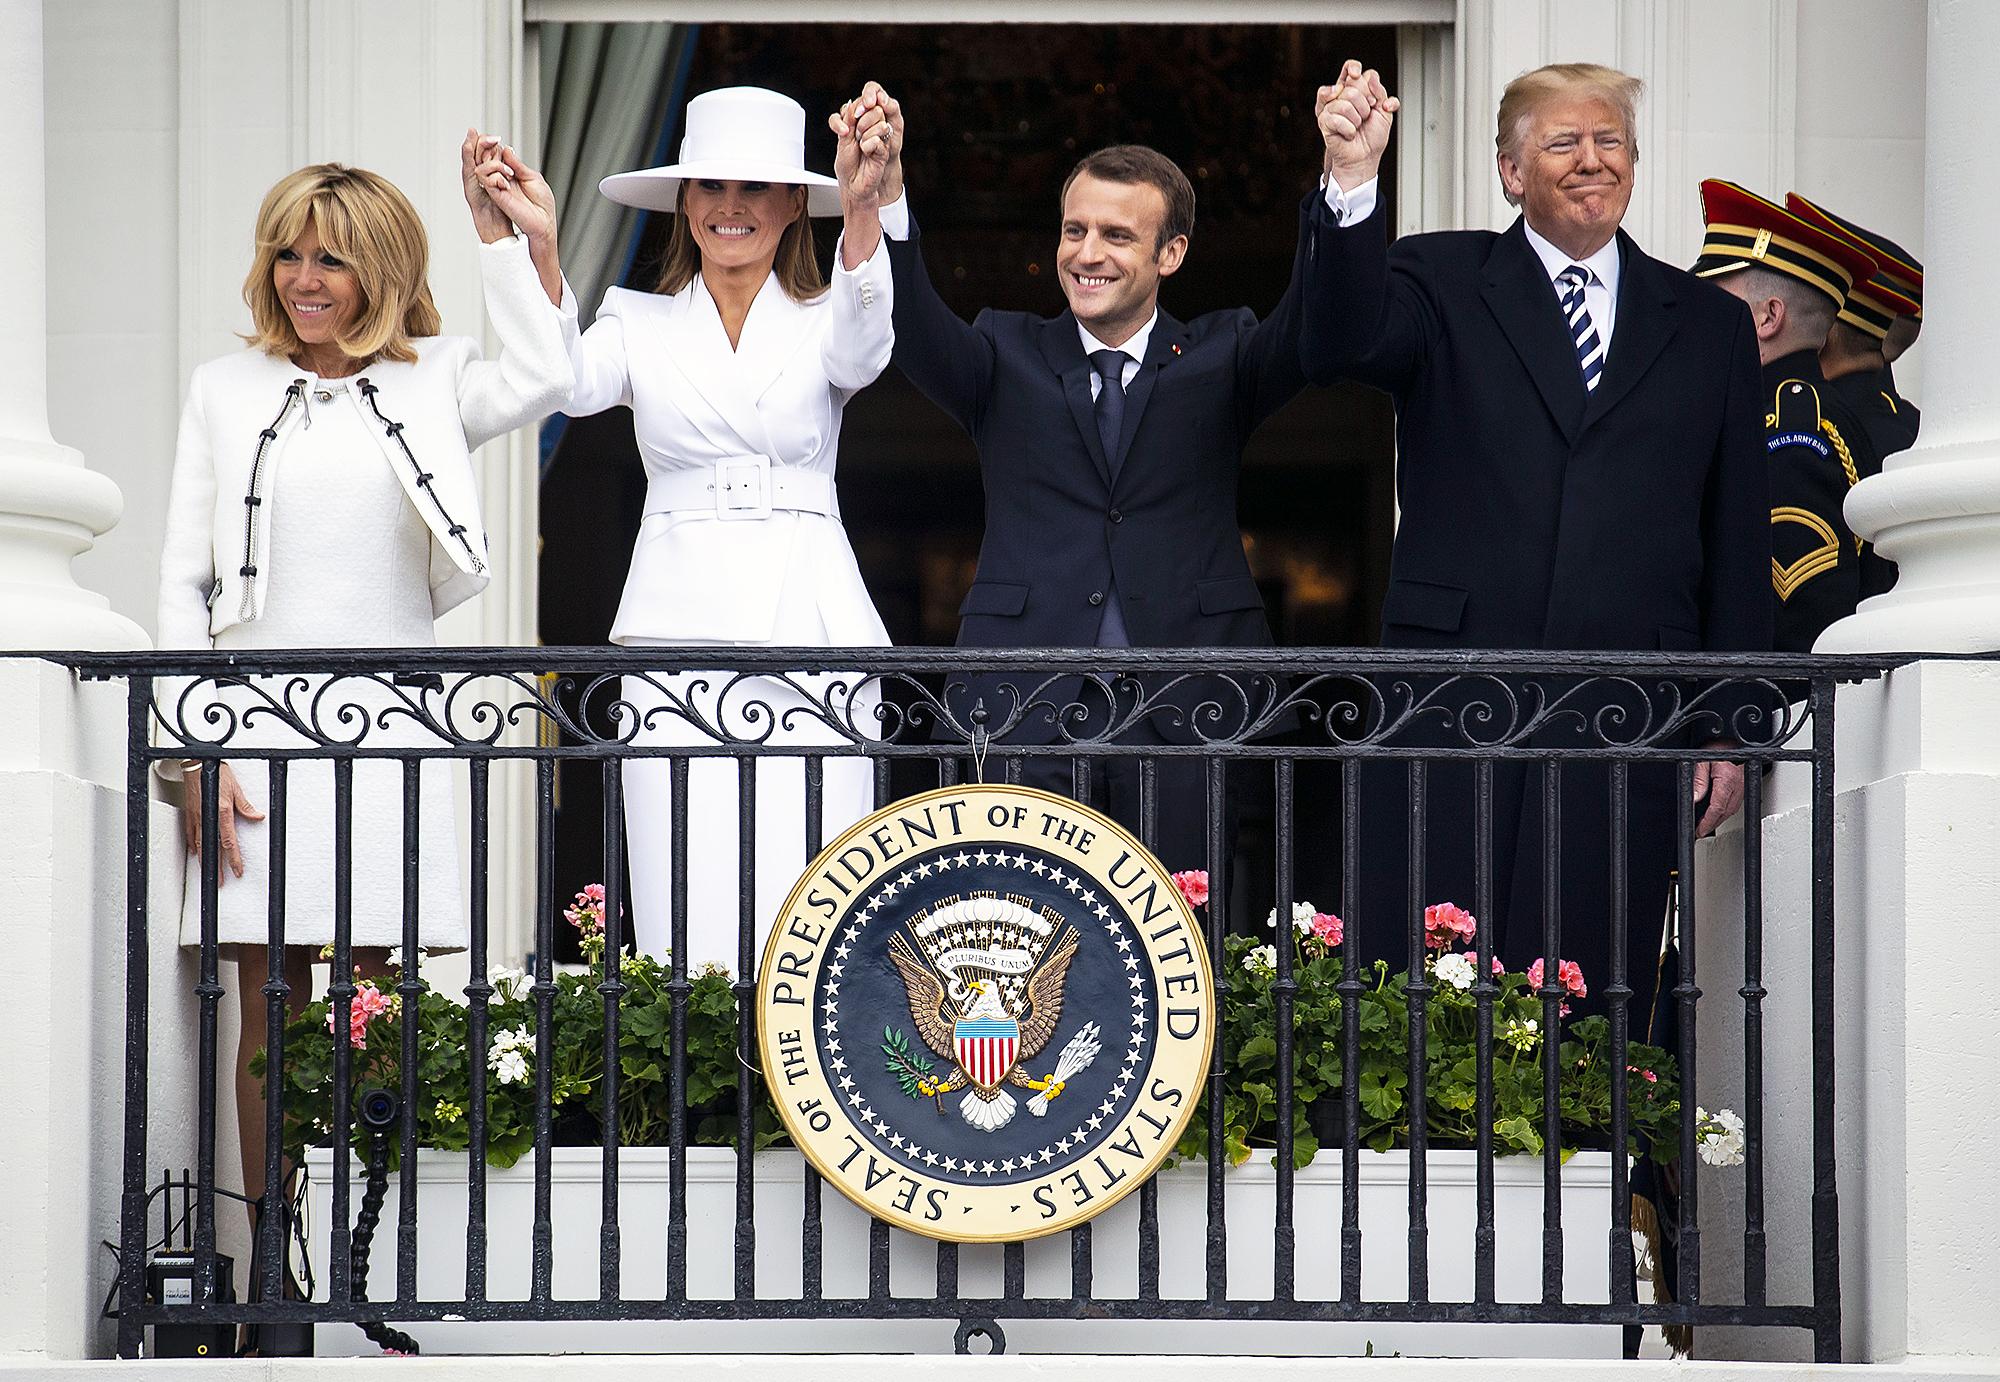 Brigitte Macron Melania Trump Emmanuel Macron Donald Trump holding hands